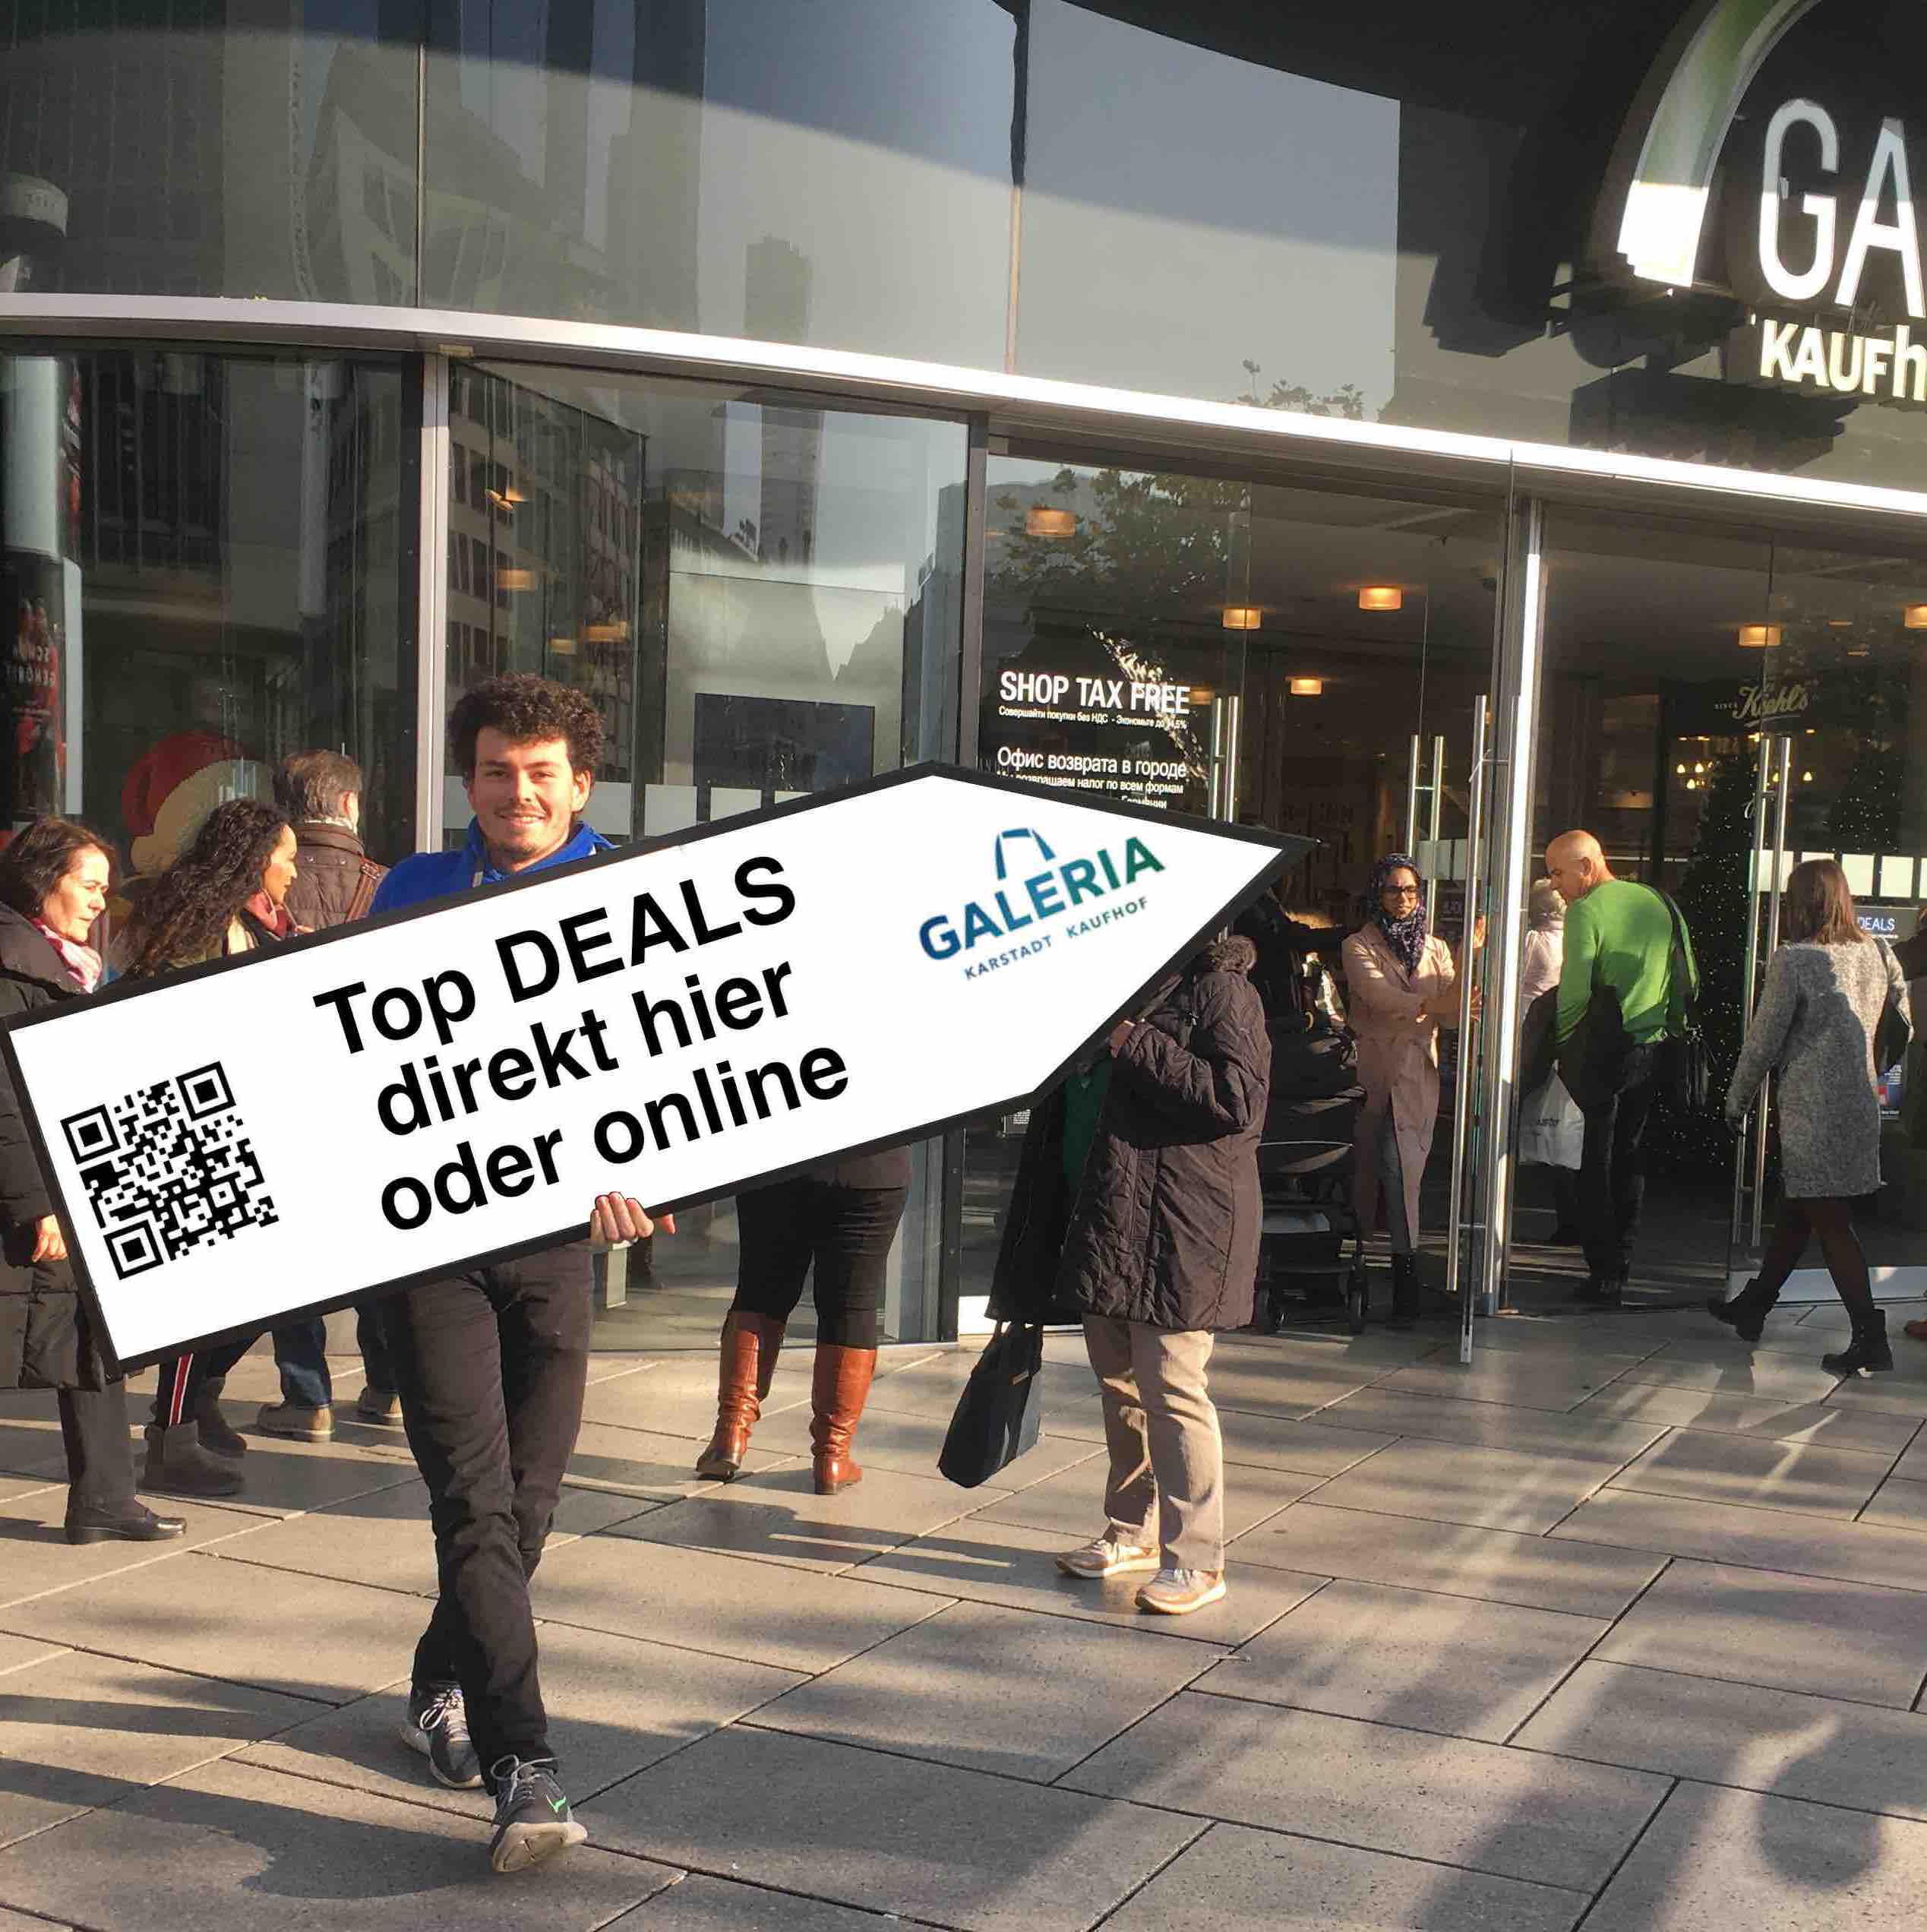 Galeria-Karstadt-Kaufhof-QR-Code-Black-Friday-Corona